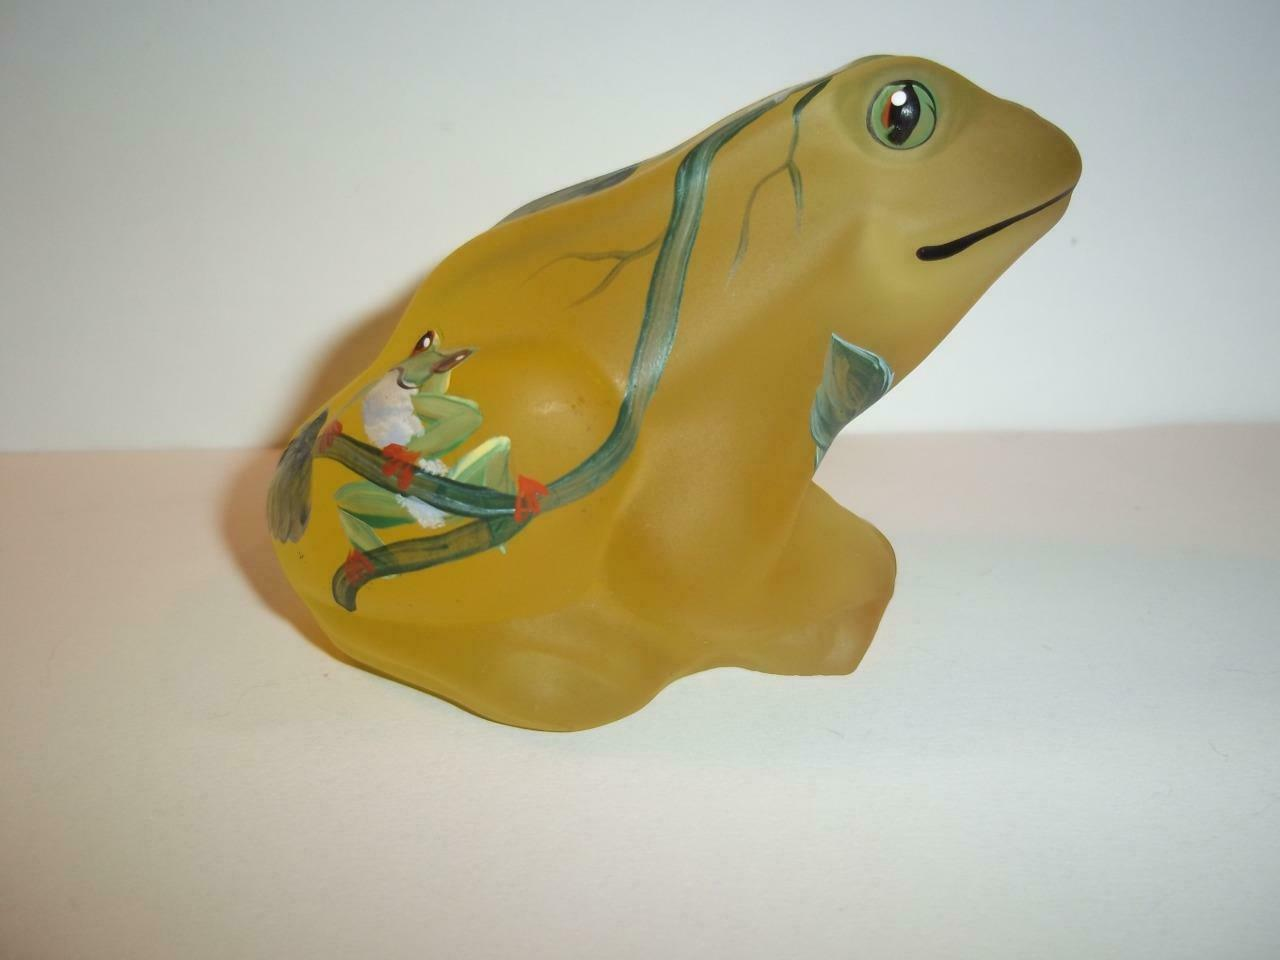 Fenton Glass BUTTERCUP YELLOW SATIN HP FROG Ltd FAGCA Exclusive by CC Hardman